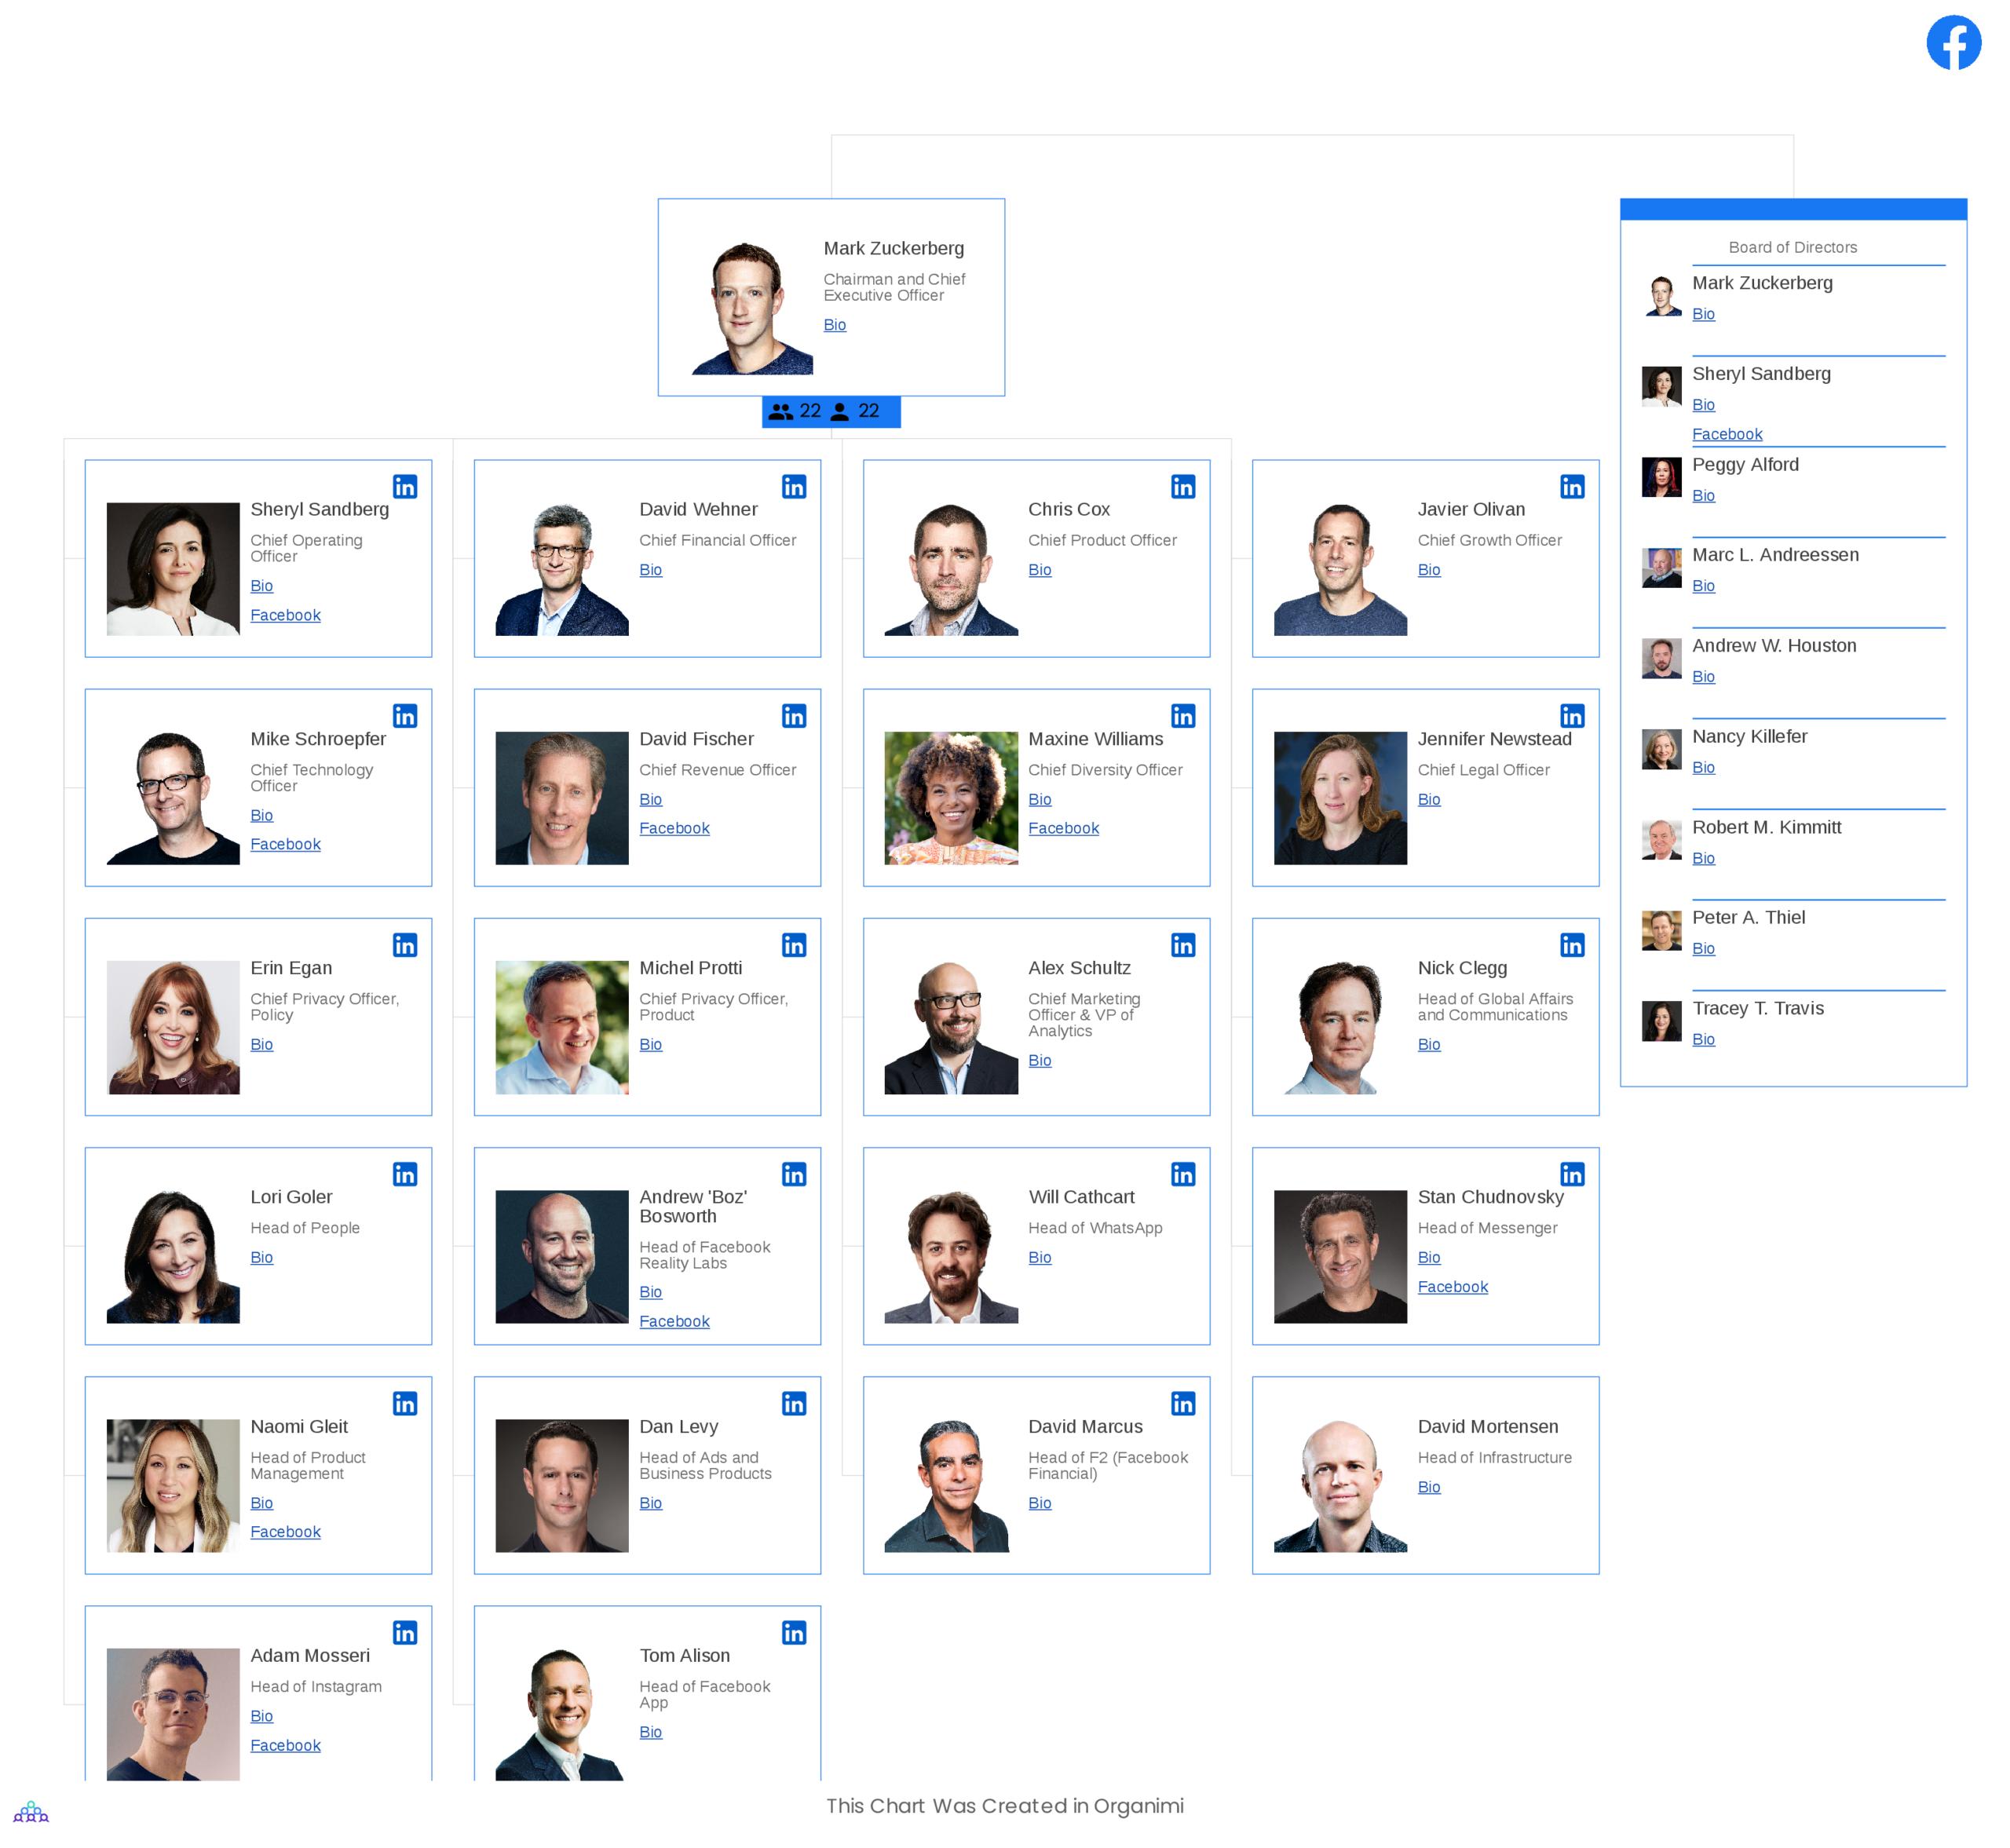 Facebook's Organizational Structure